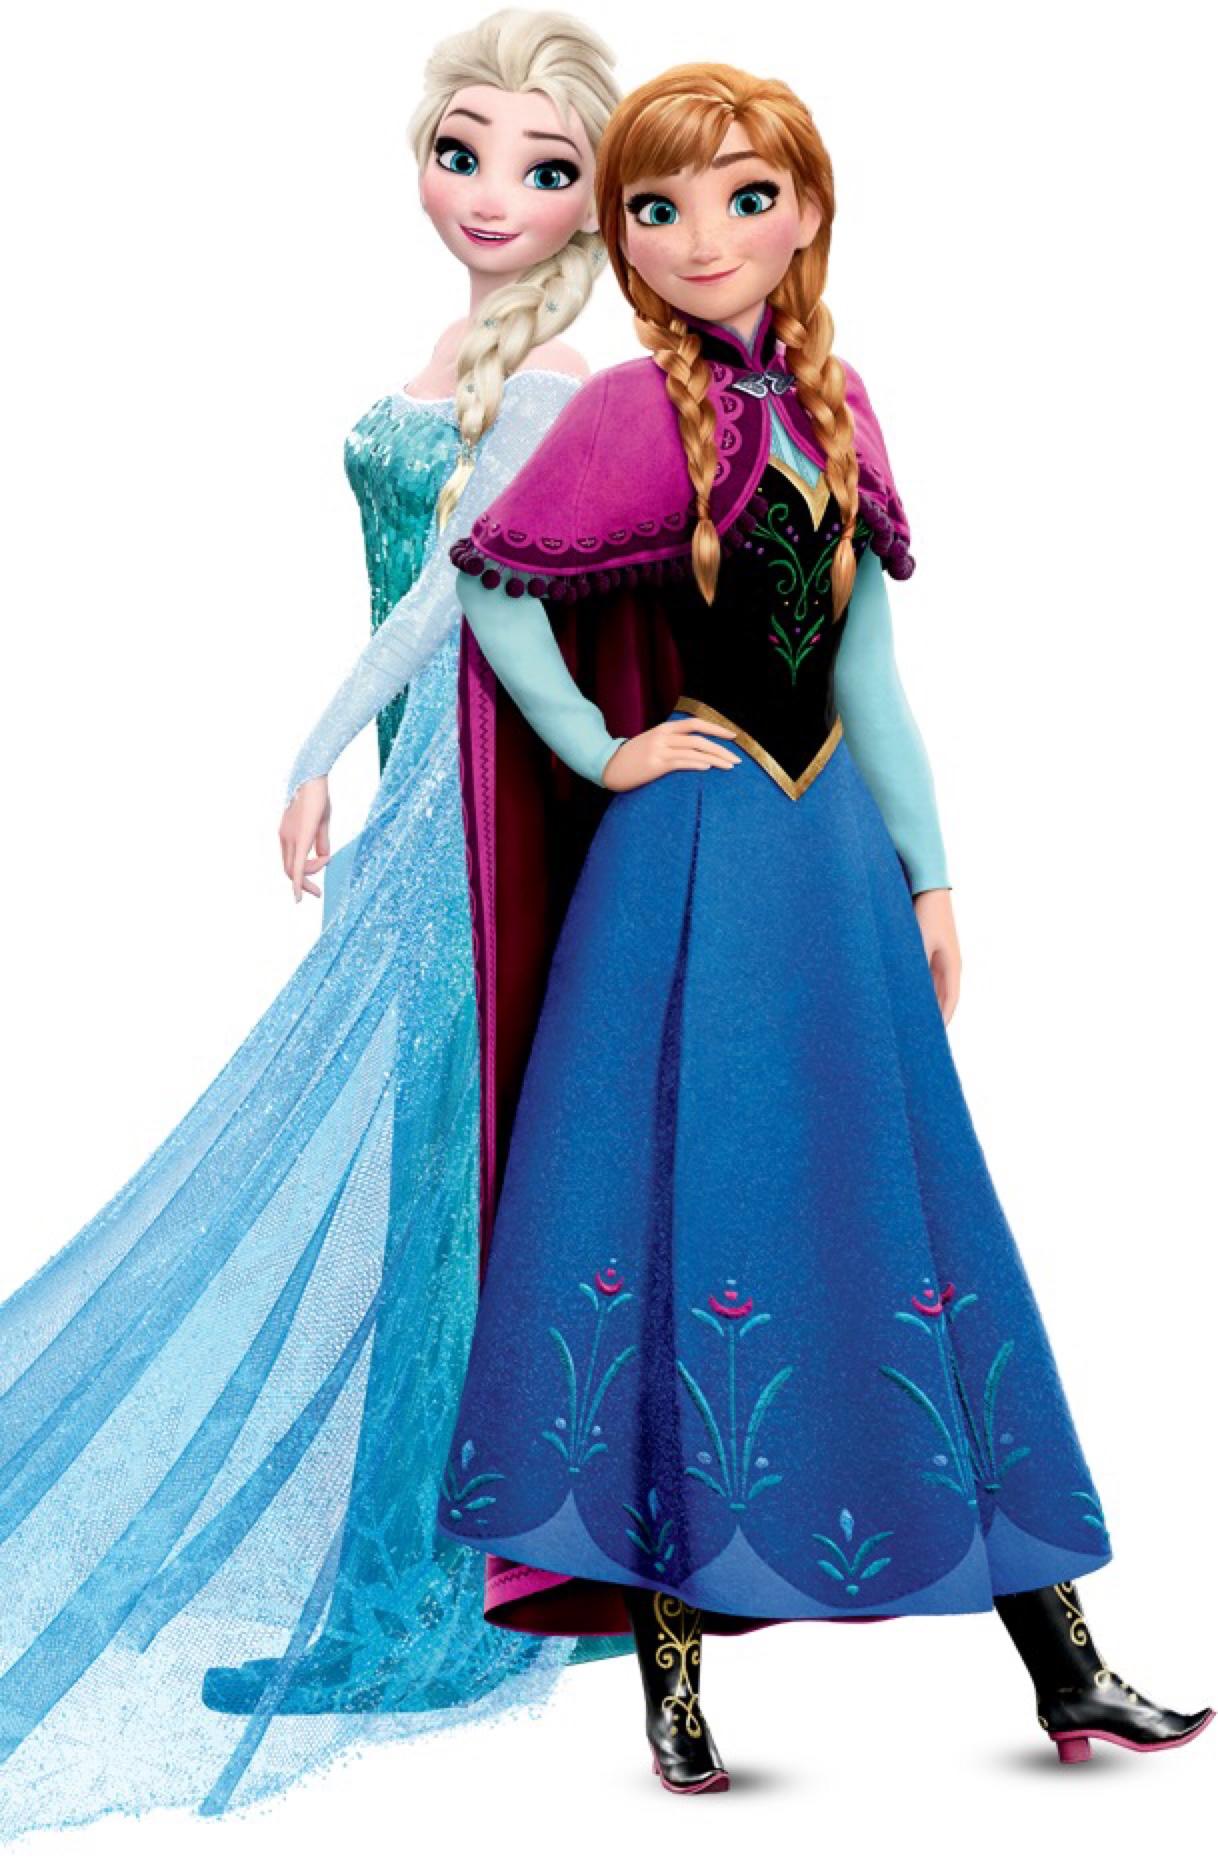 Elsa And Anna Elsa E Ana Fotografia 39135166 Fanpop